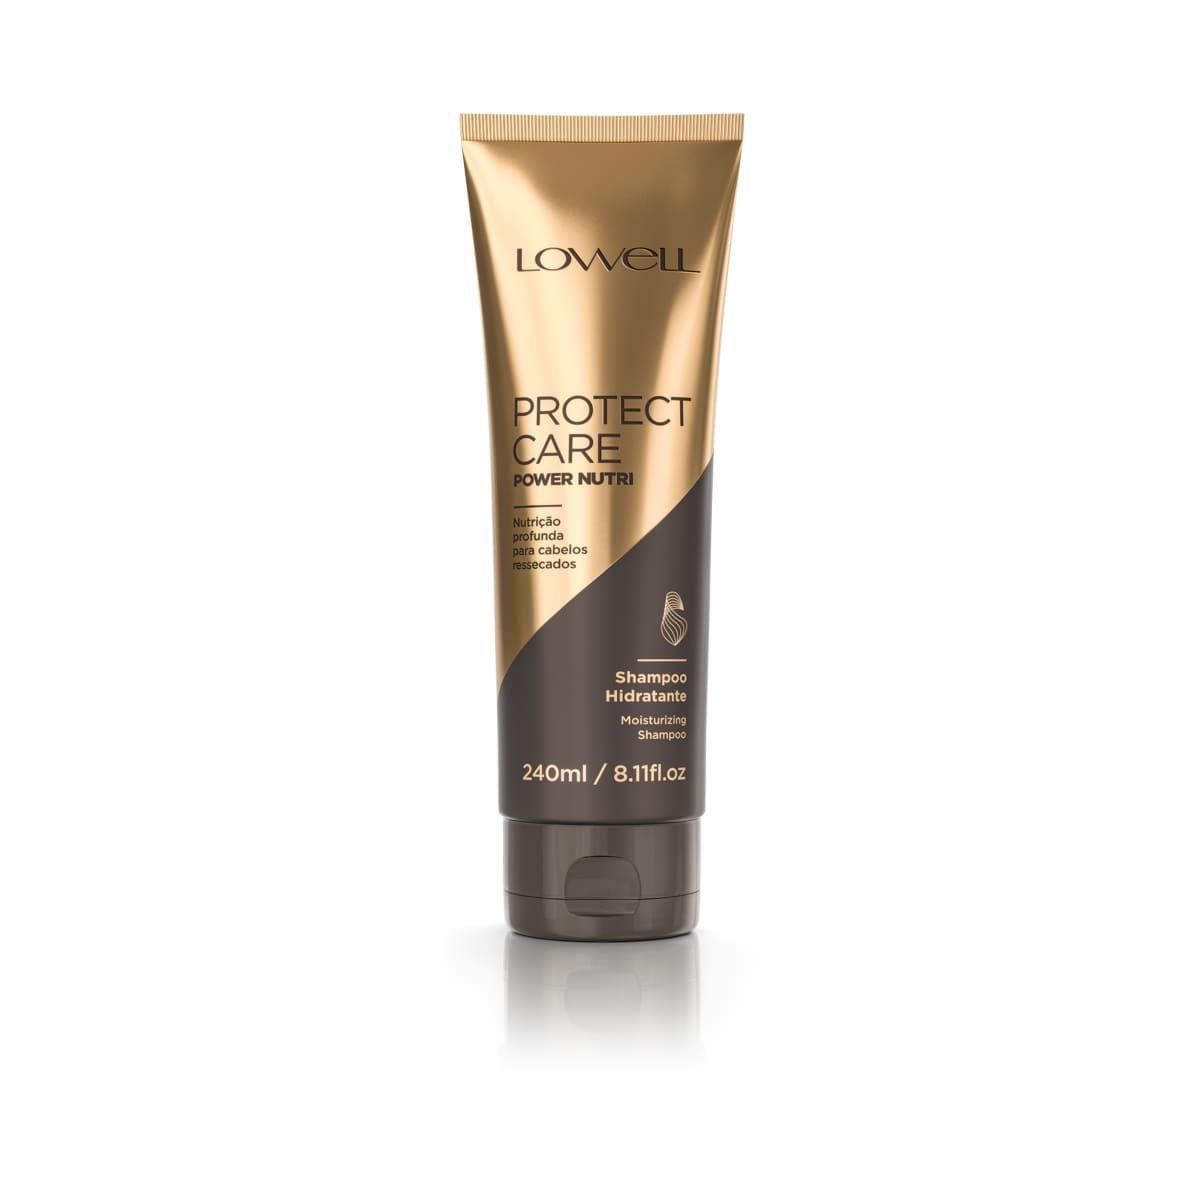 Shampoo Protect Care Power Nutri - 240ml